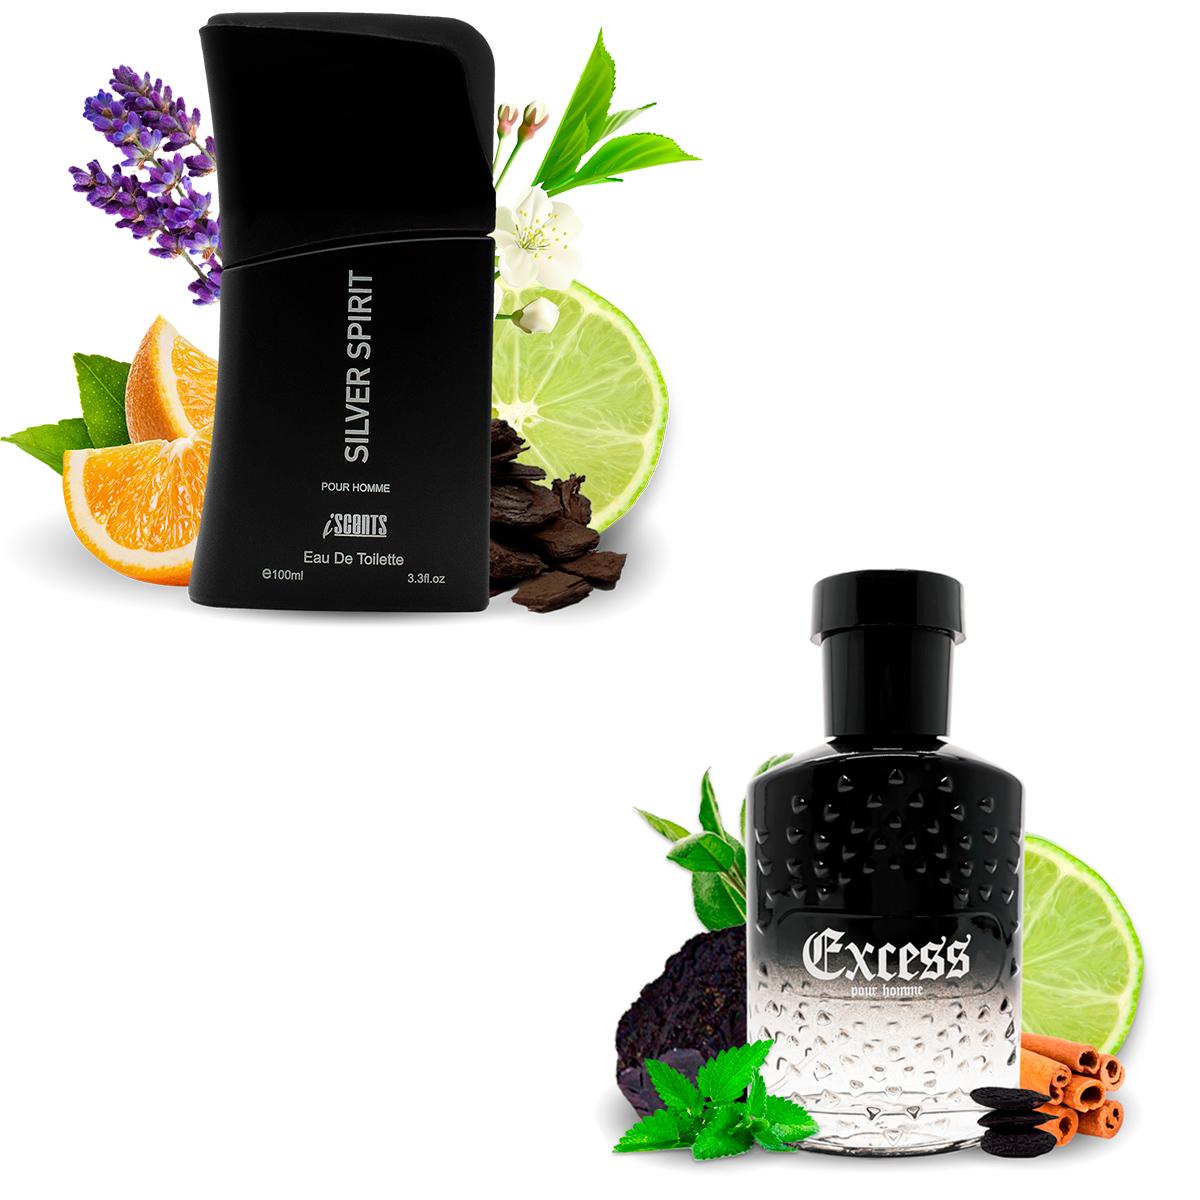 Kit 2 Perfumes Importados Silver Spirit e Excess I Scents